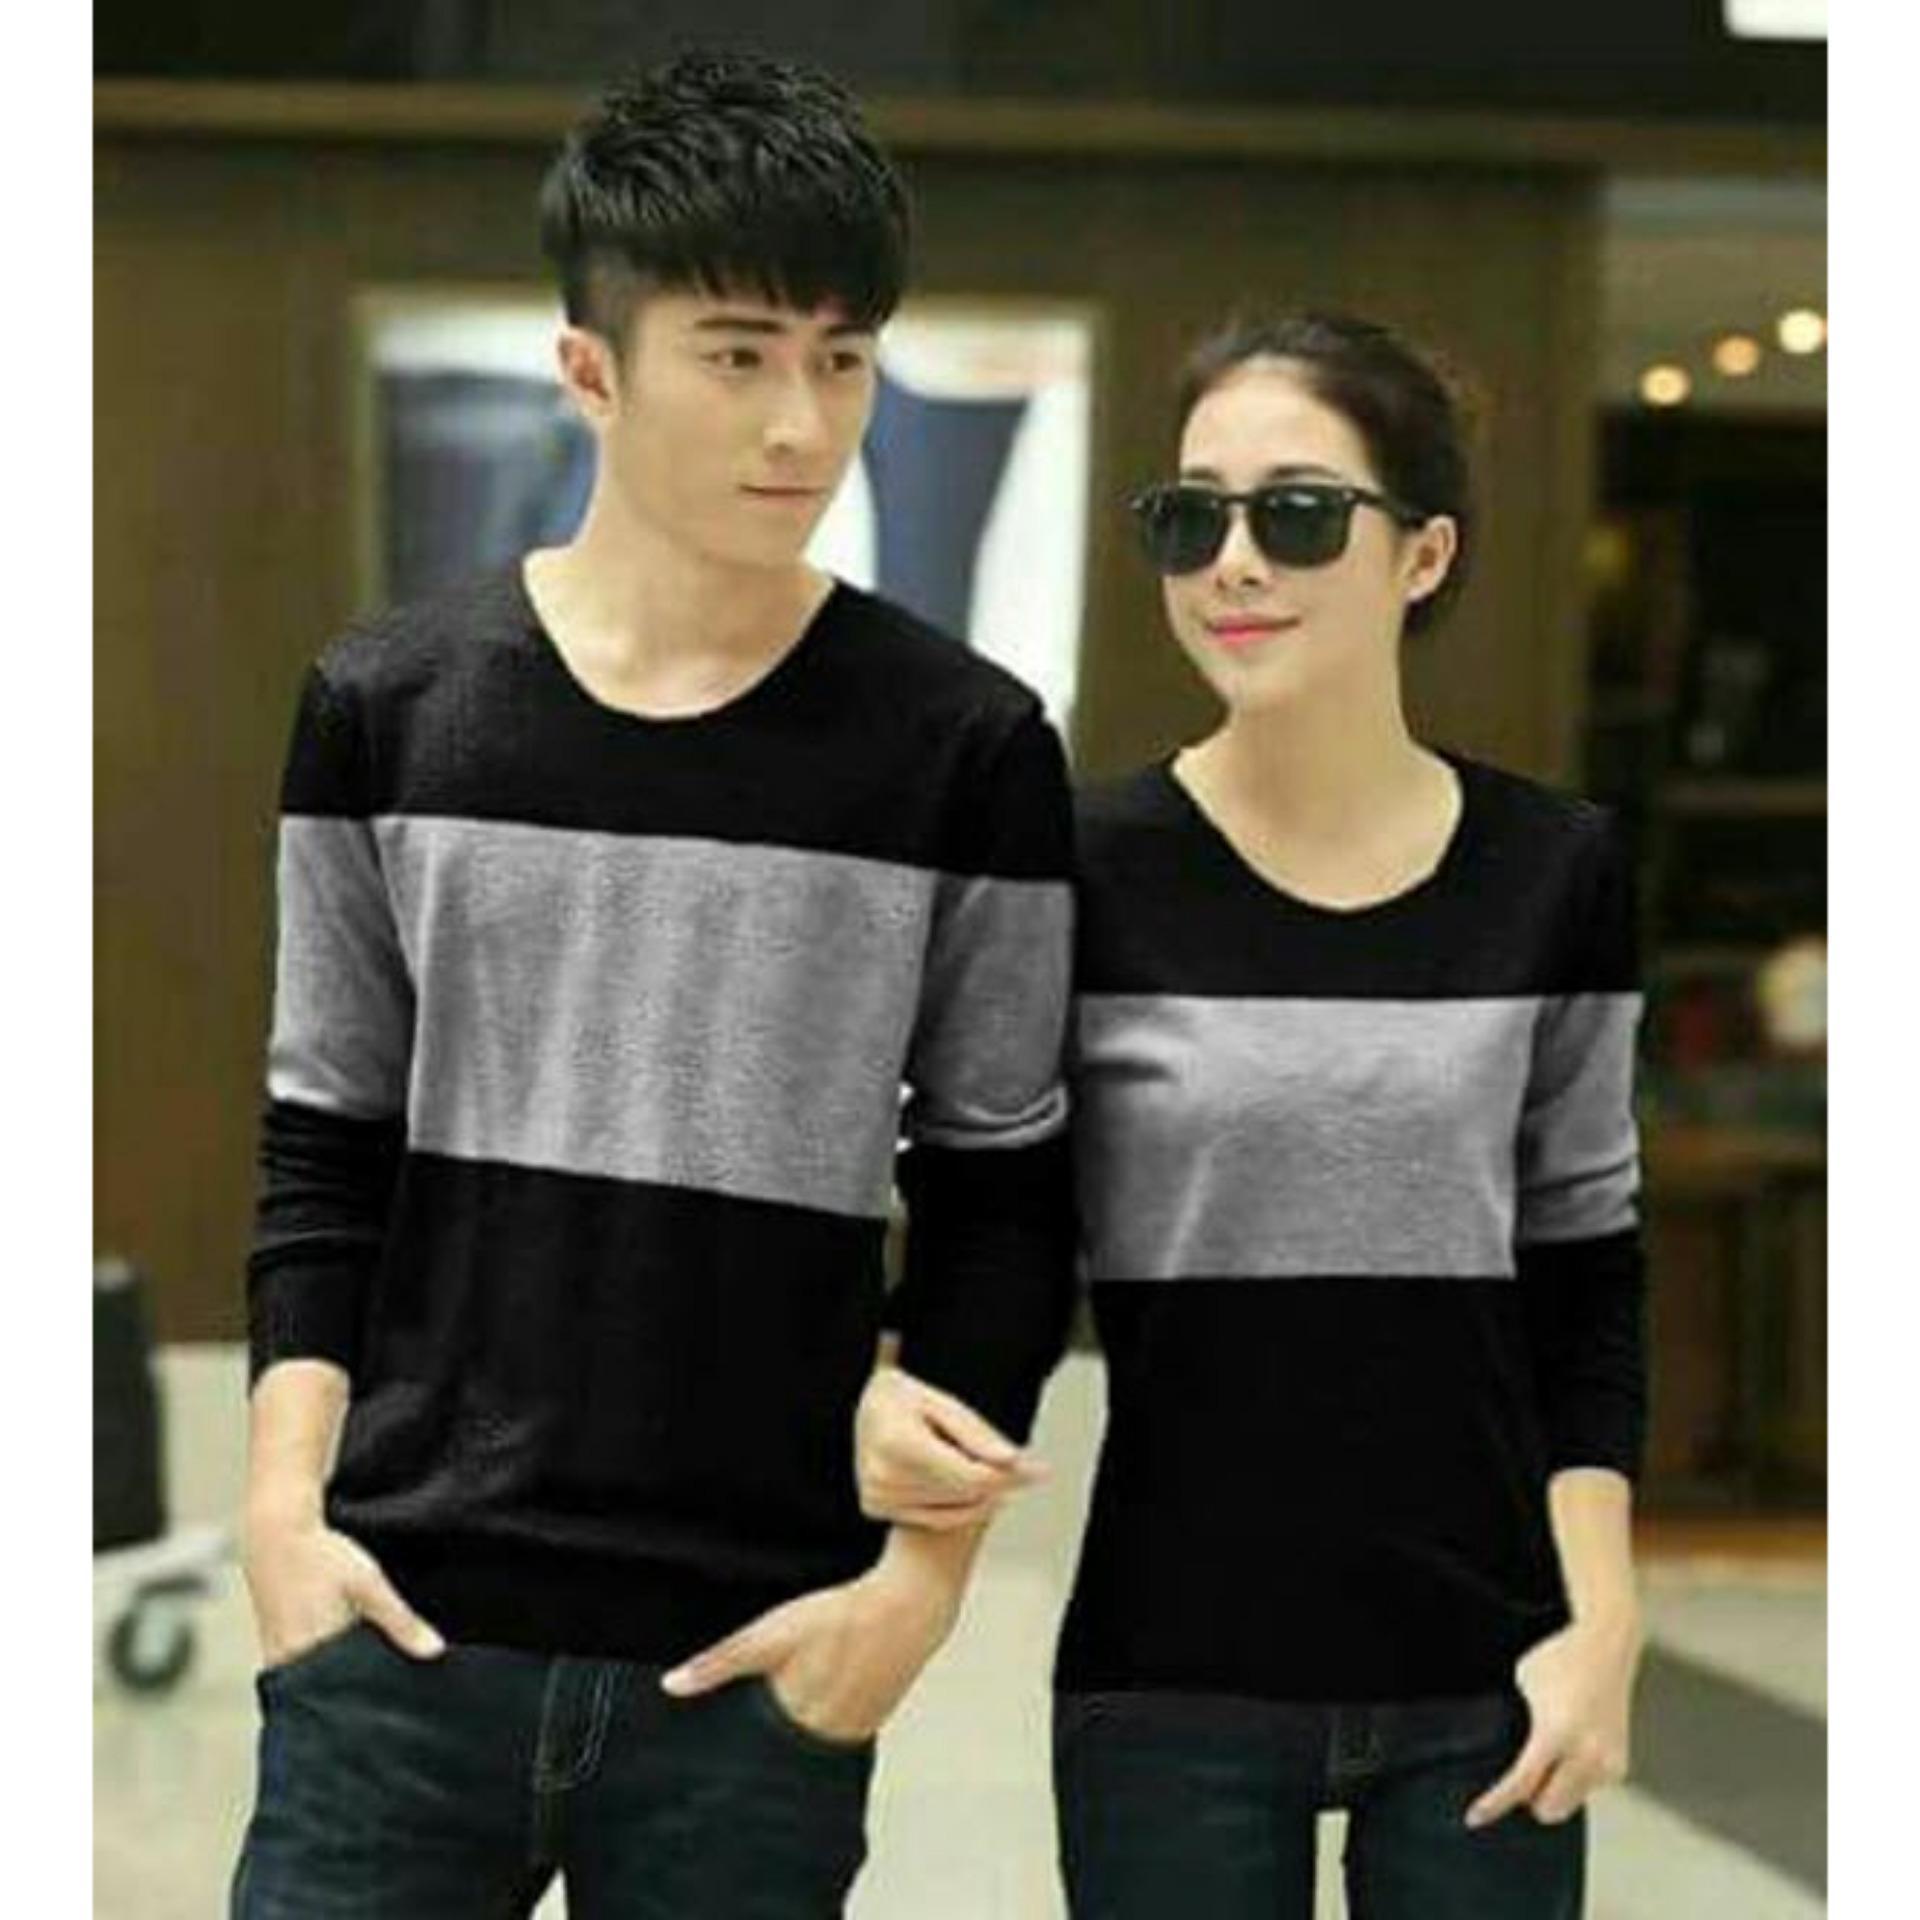 Kaos Couple Pria Wanita lengan Panjang / Kaos Polos / T Shirt Wanita Spandek / Bagus